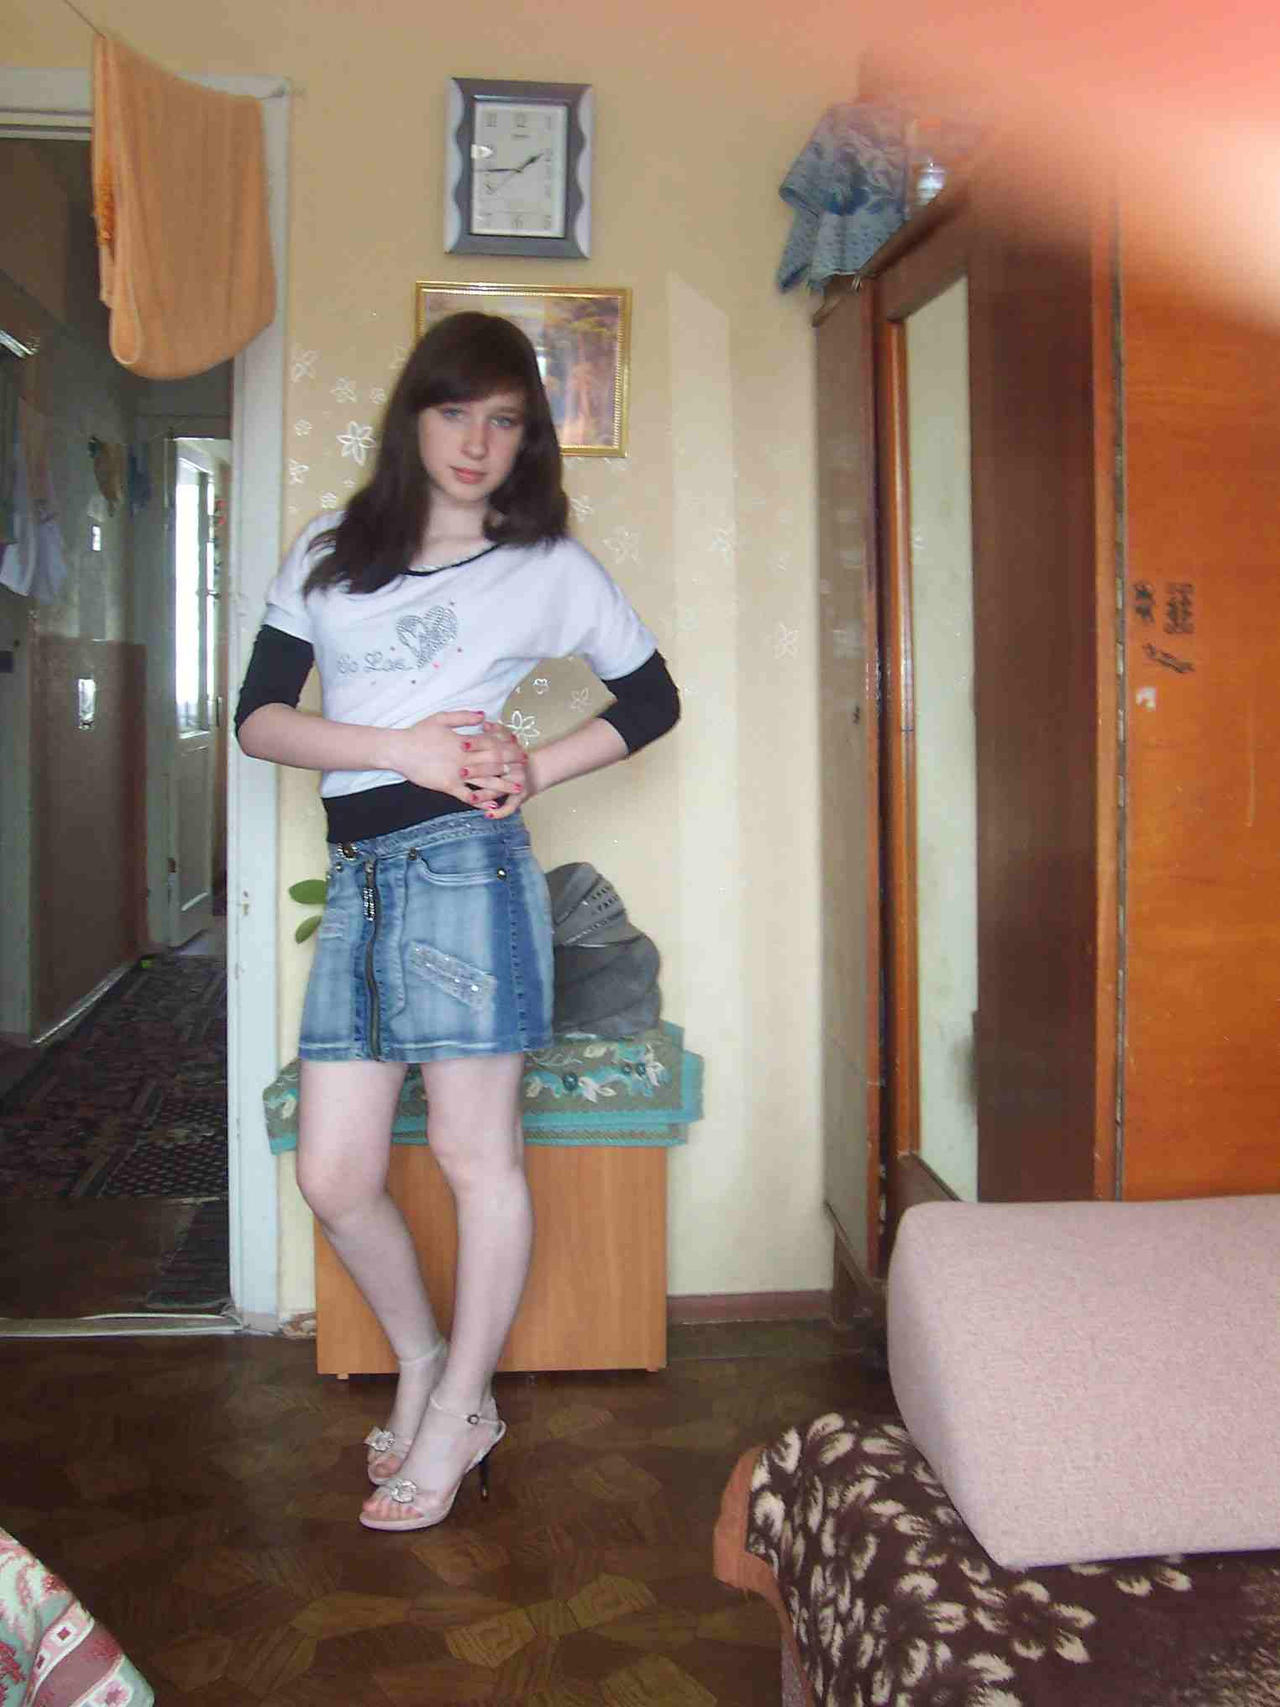 Girl's feet would grow soon by Blackusurp on DeviantArt